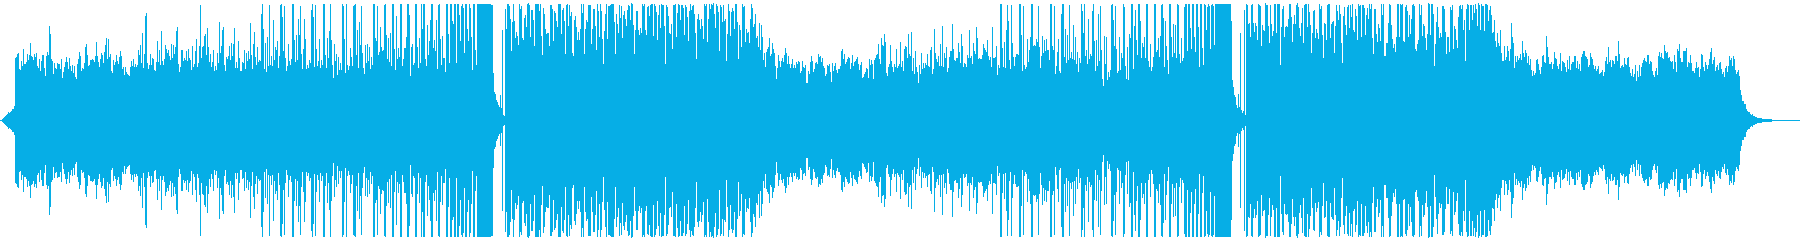 FuturePop2、お洒落、洋楽、夏Lの再生済みの波形